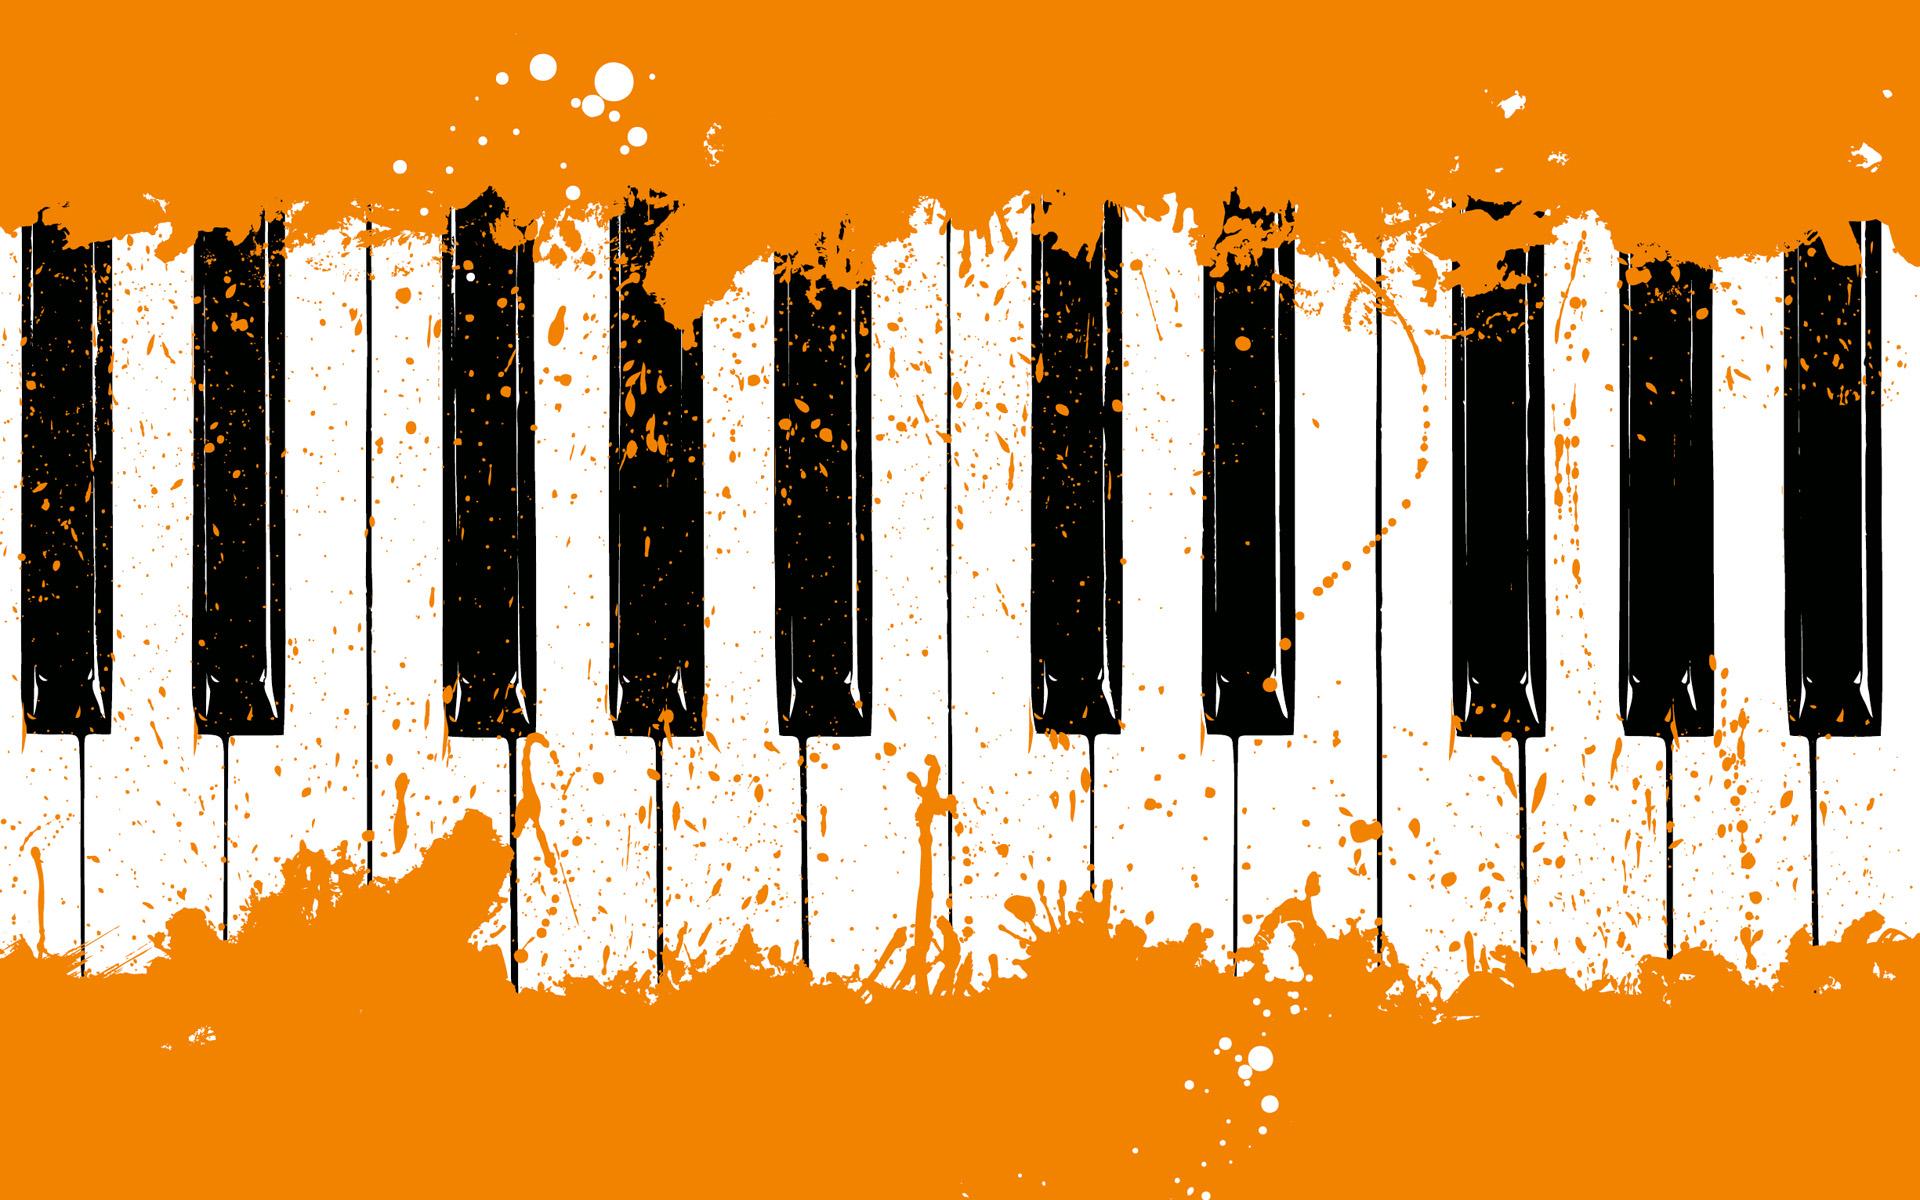 Most Inspiring Wallpaper Music Computer - CMU147cover1920x1200  HD_517537.jpg